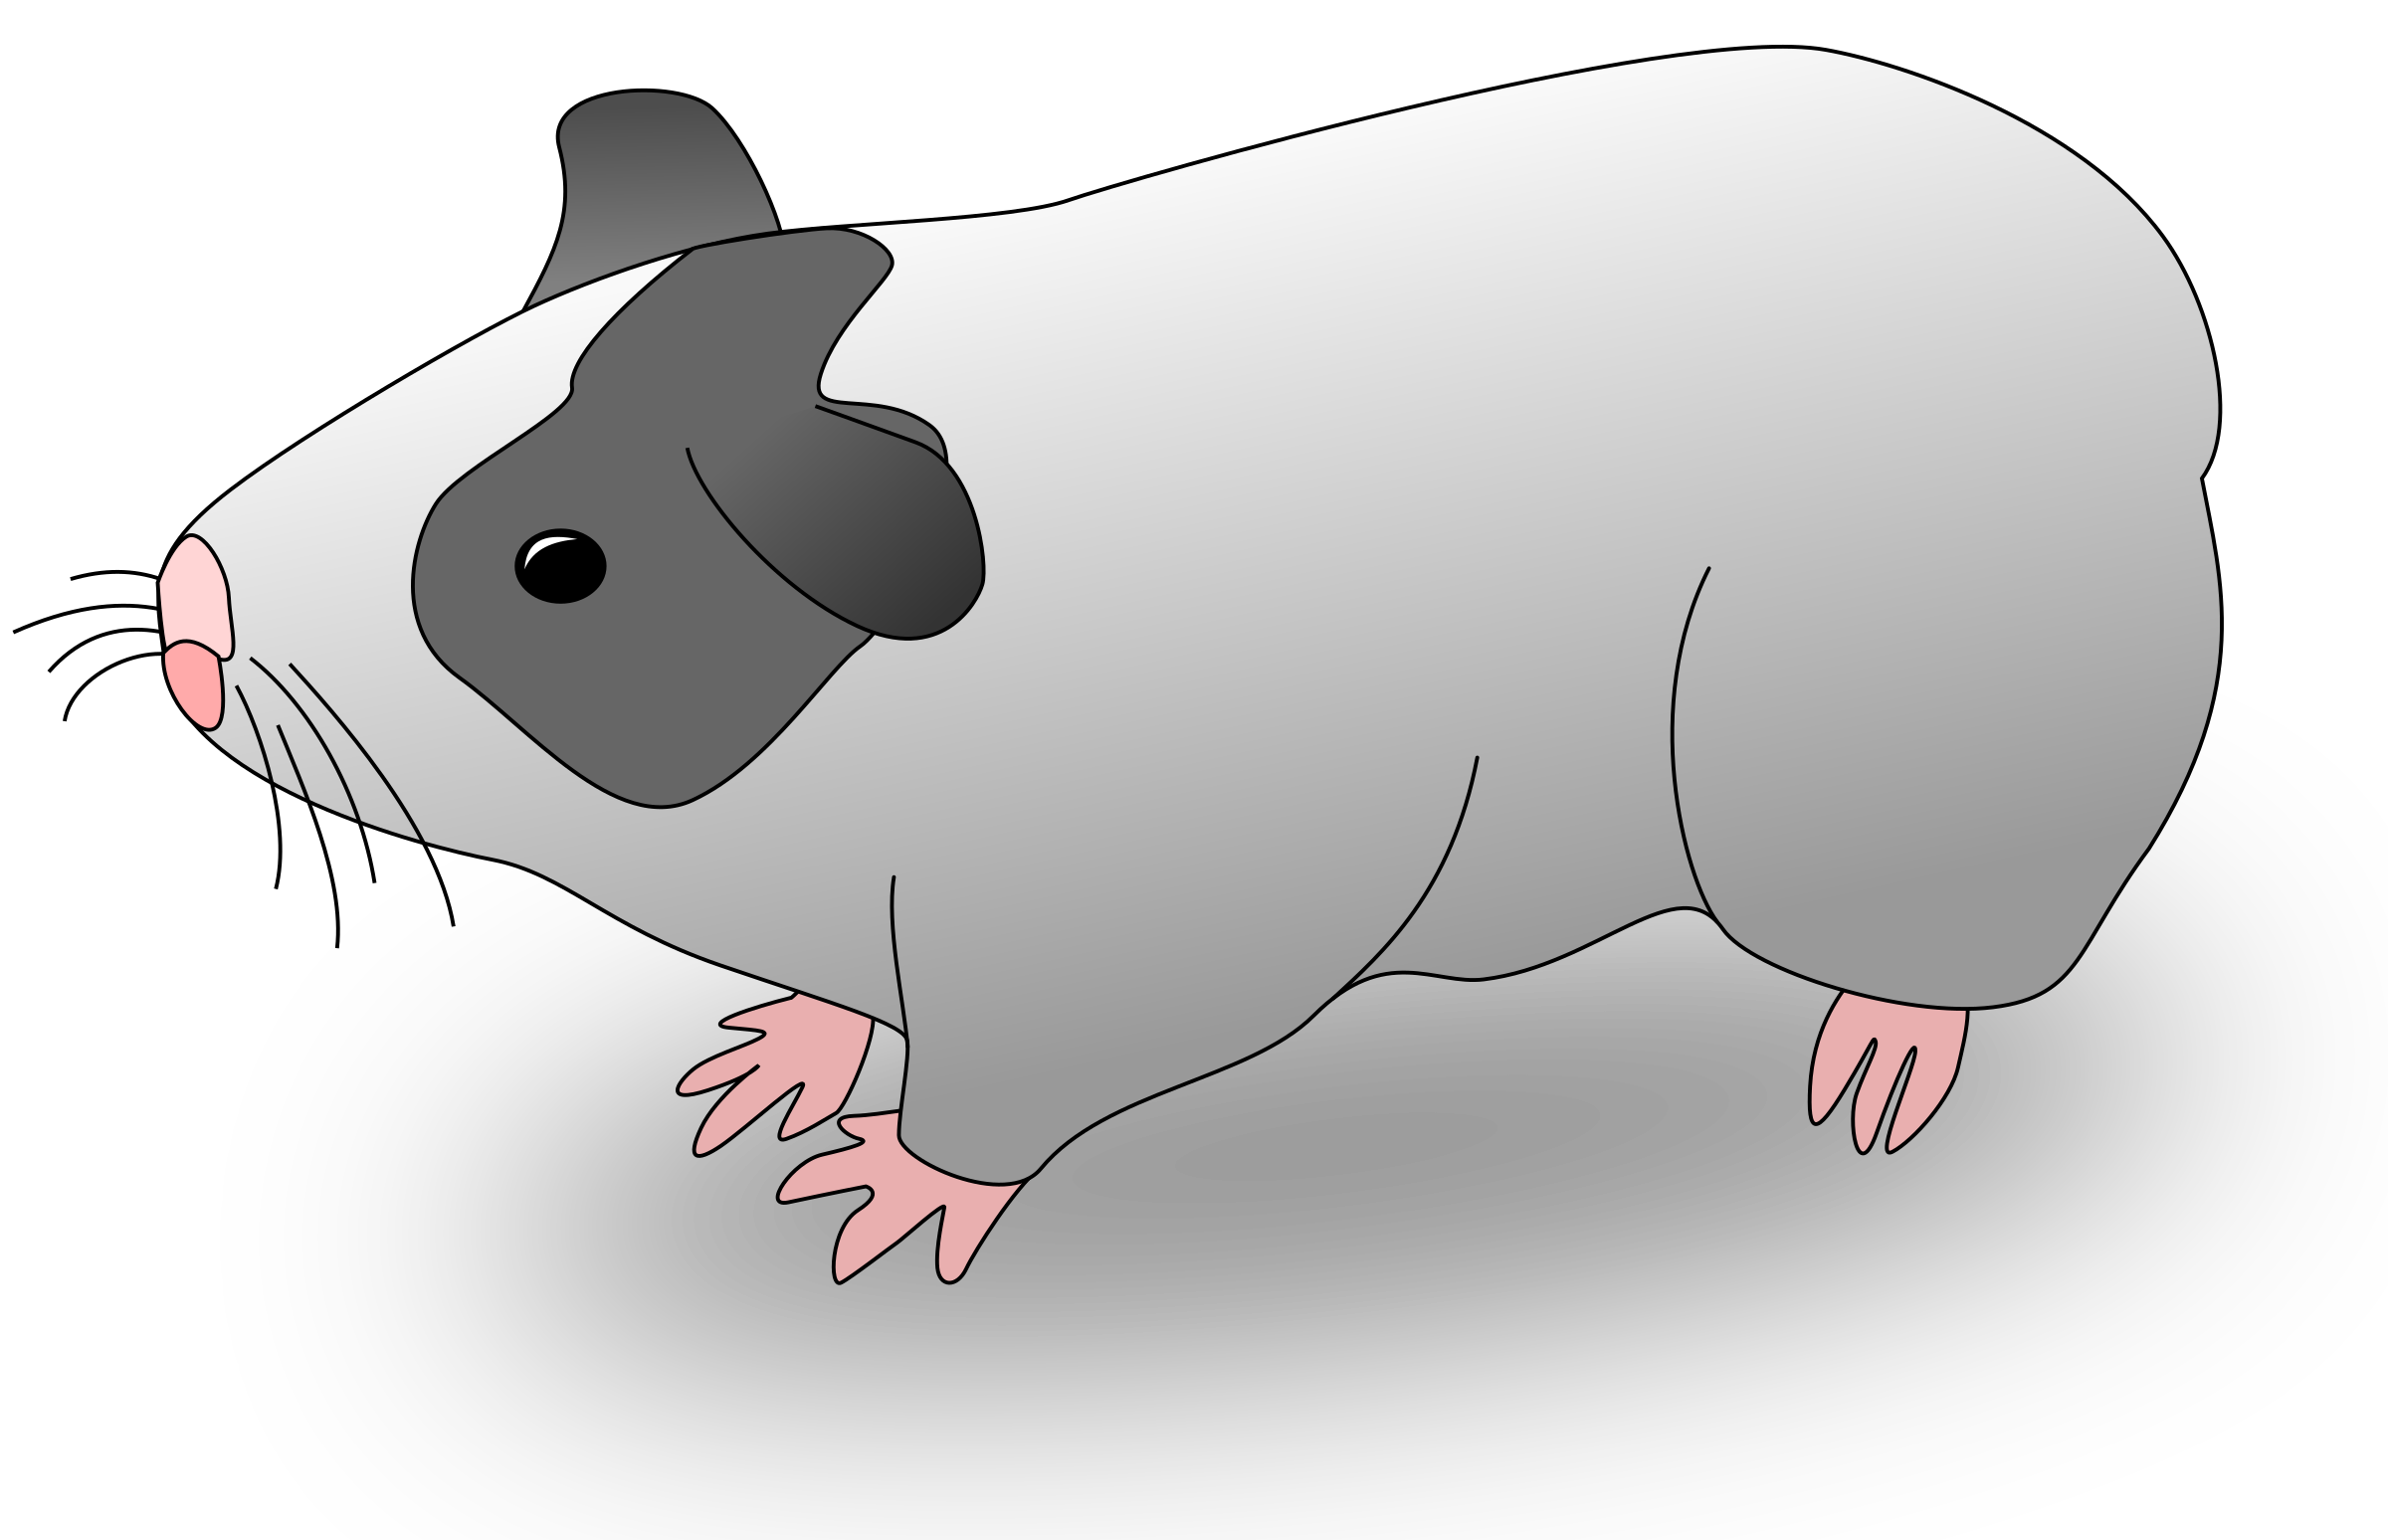 Cavia big image png. Hamster clipart guinea pig